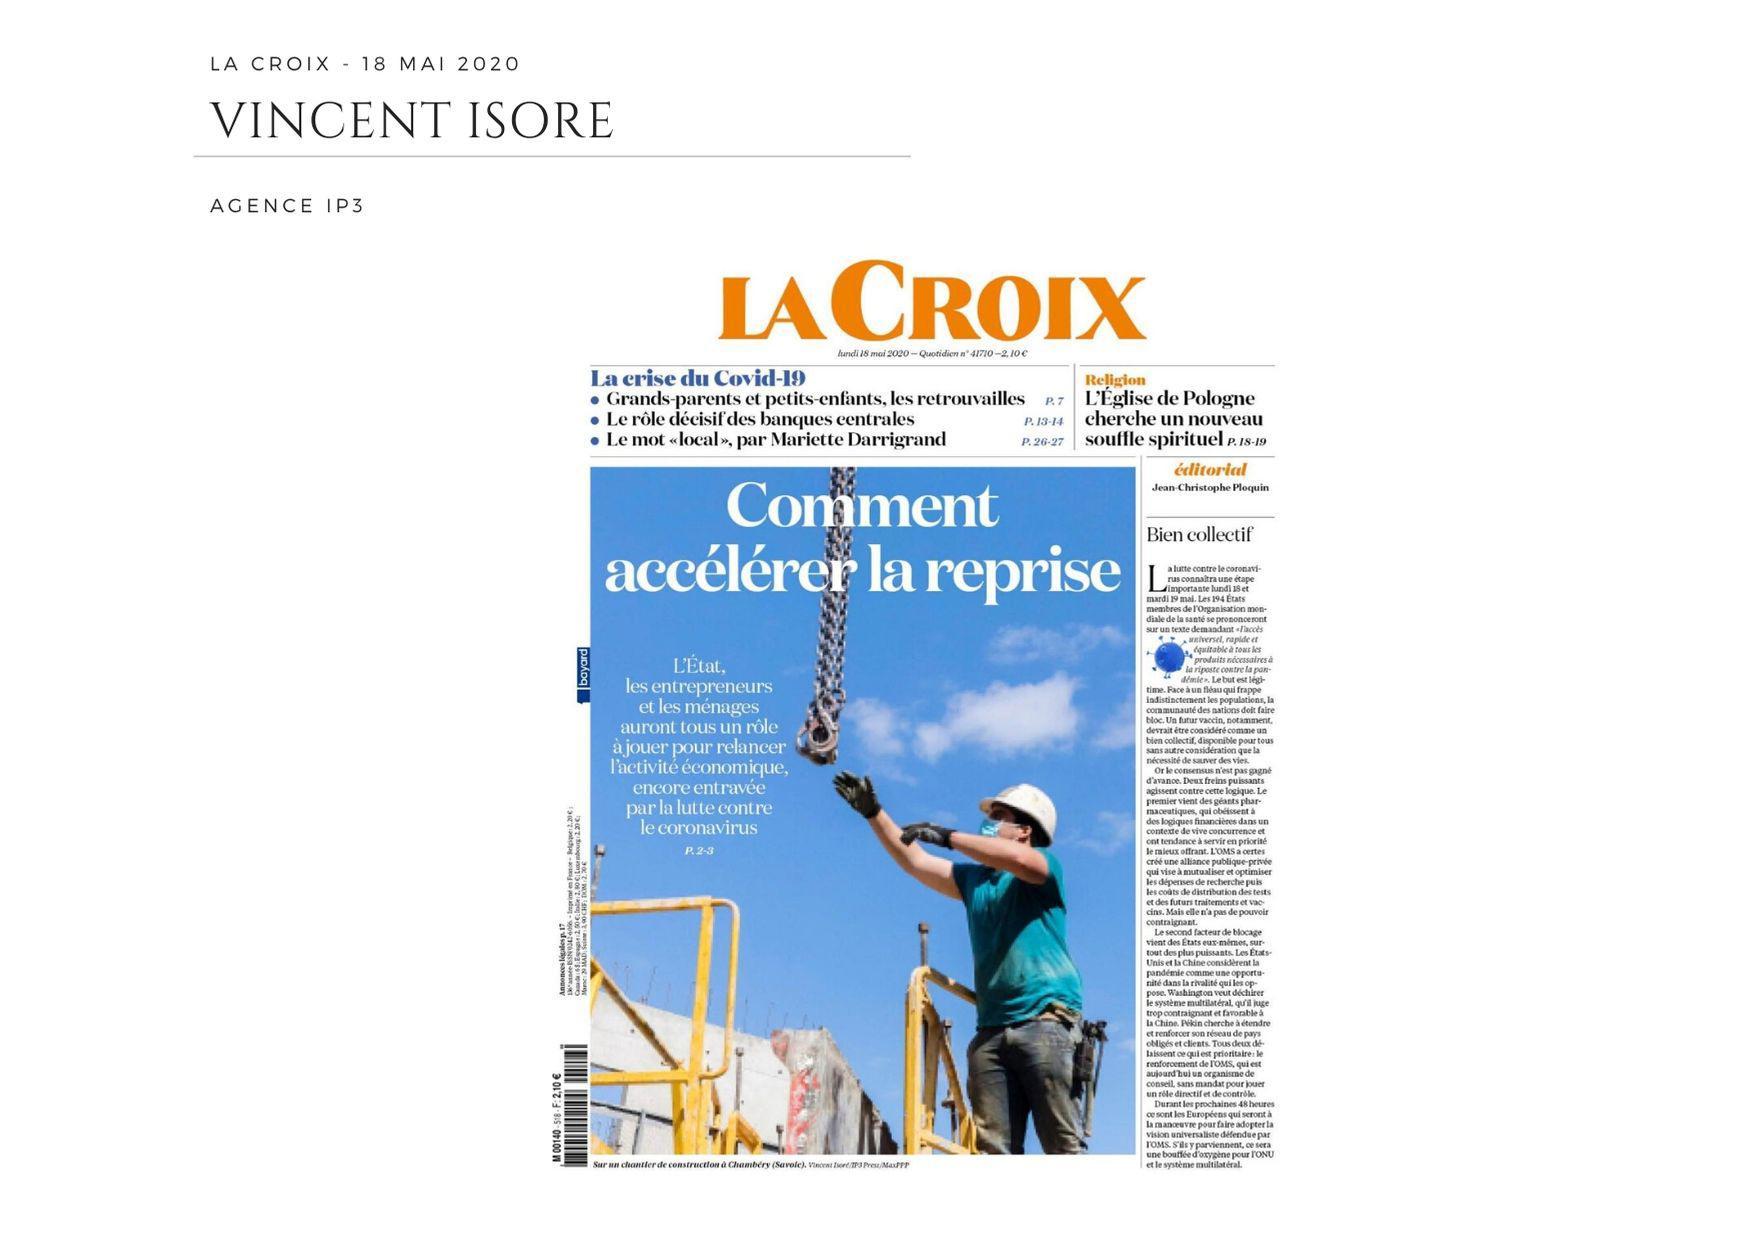 La Croix - 18 mai 2020